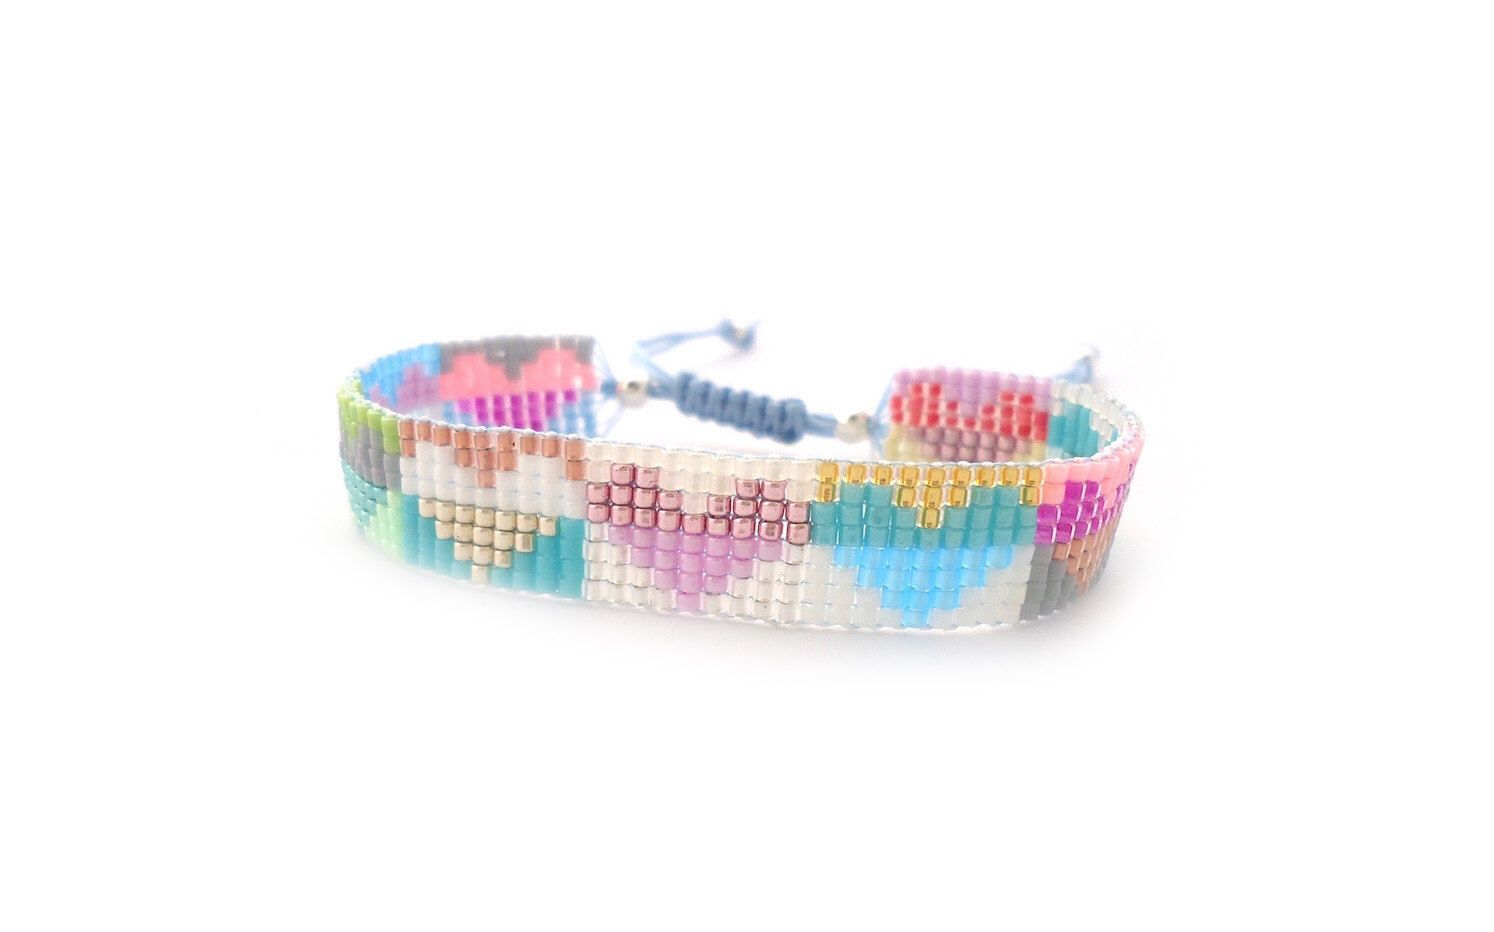 Hearts loom bracelet friendship bracelets pastel color beaded